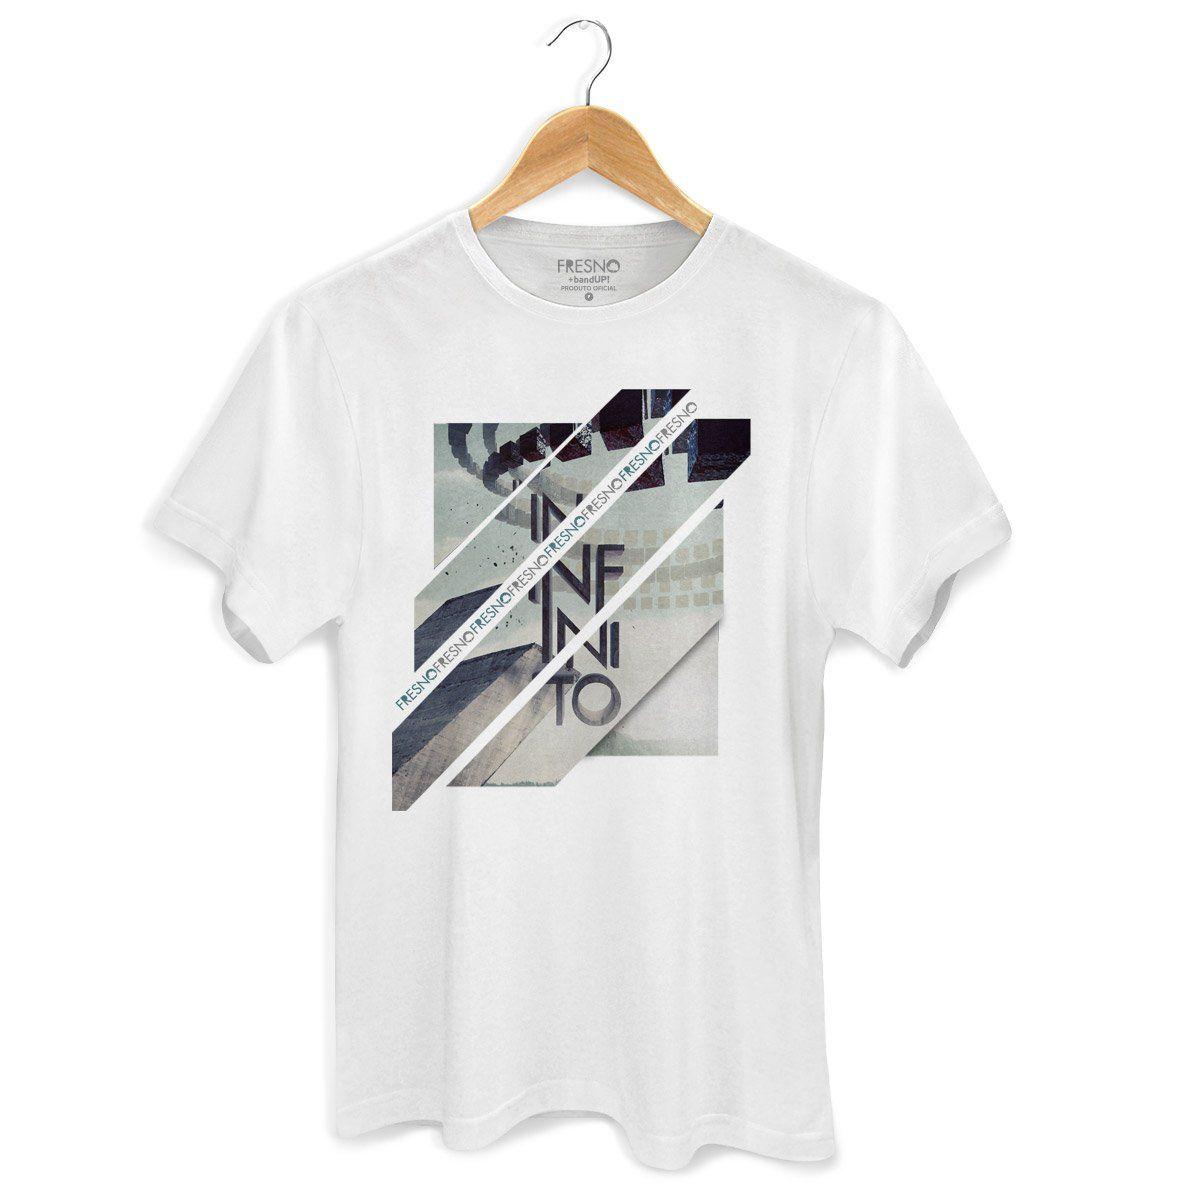 Camiseta Masculina Fresno - Infinito